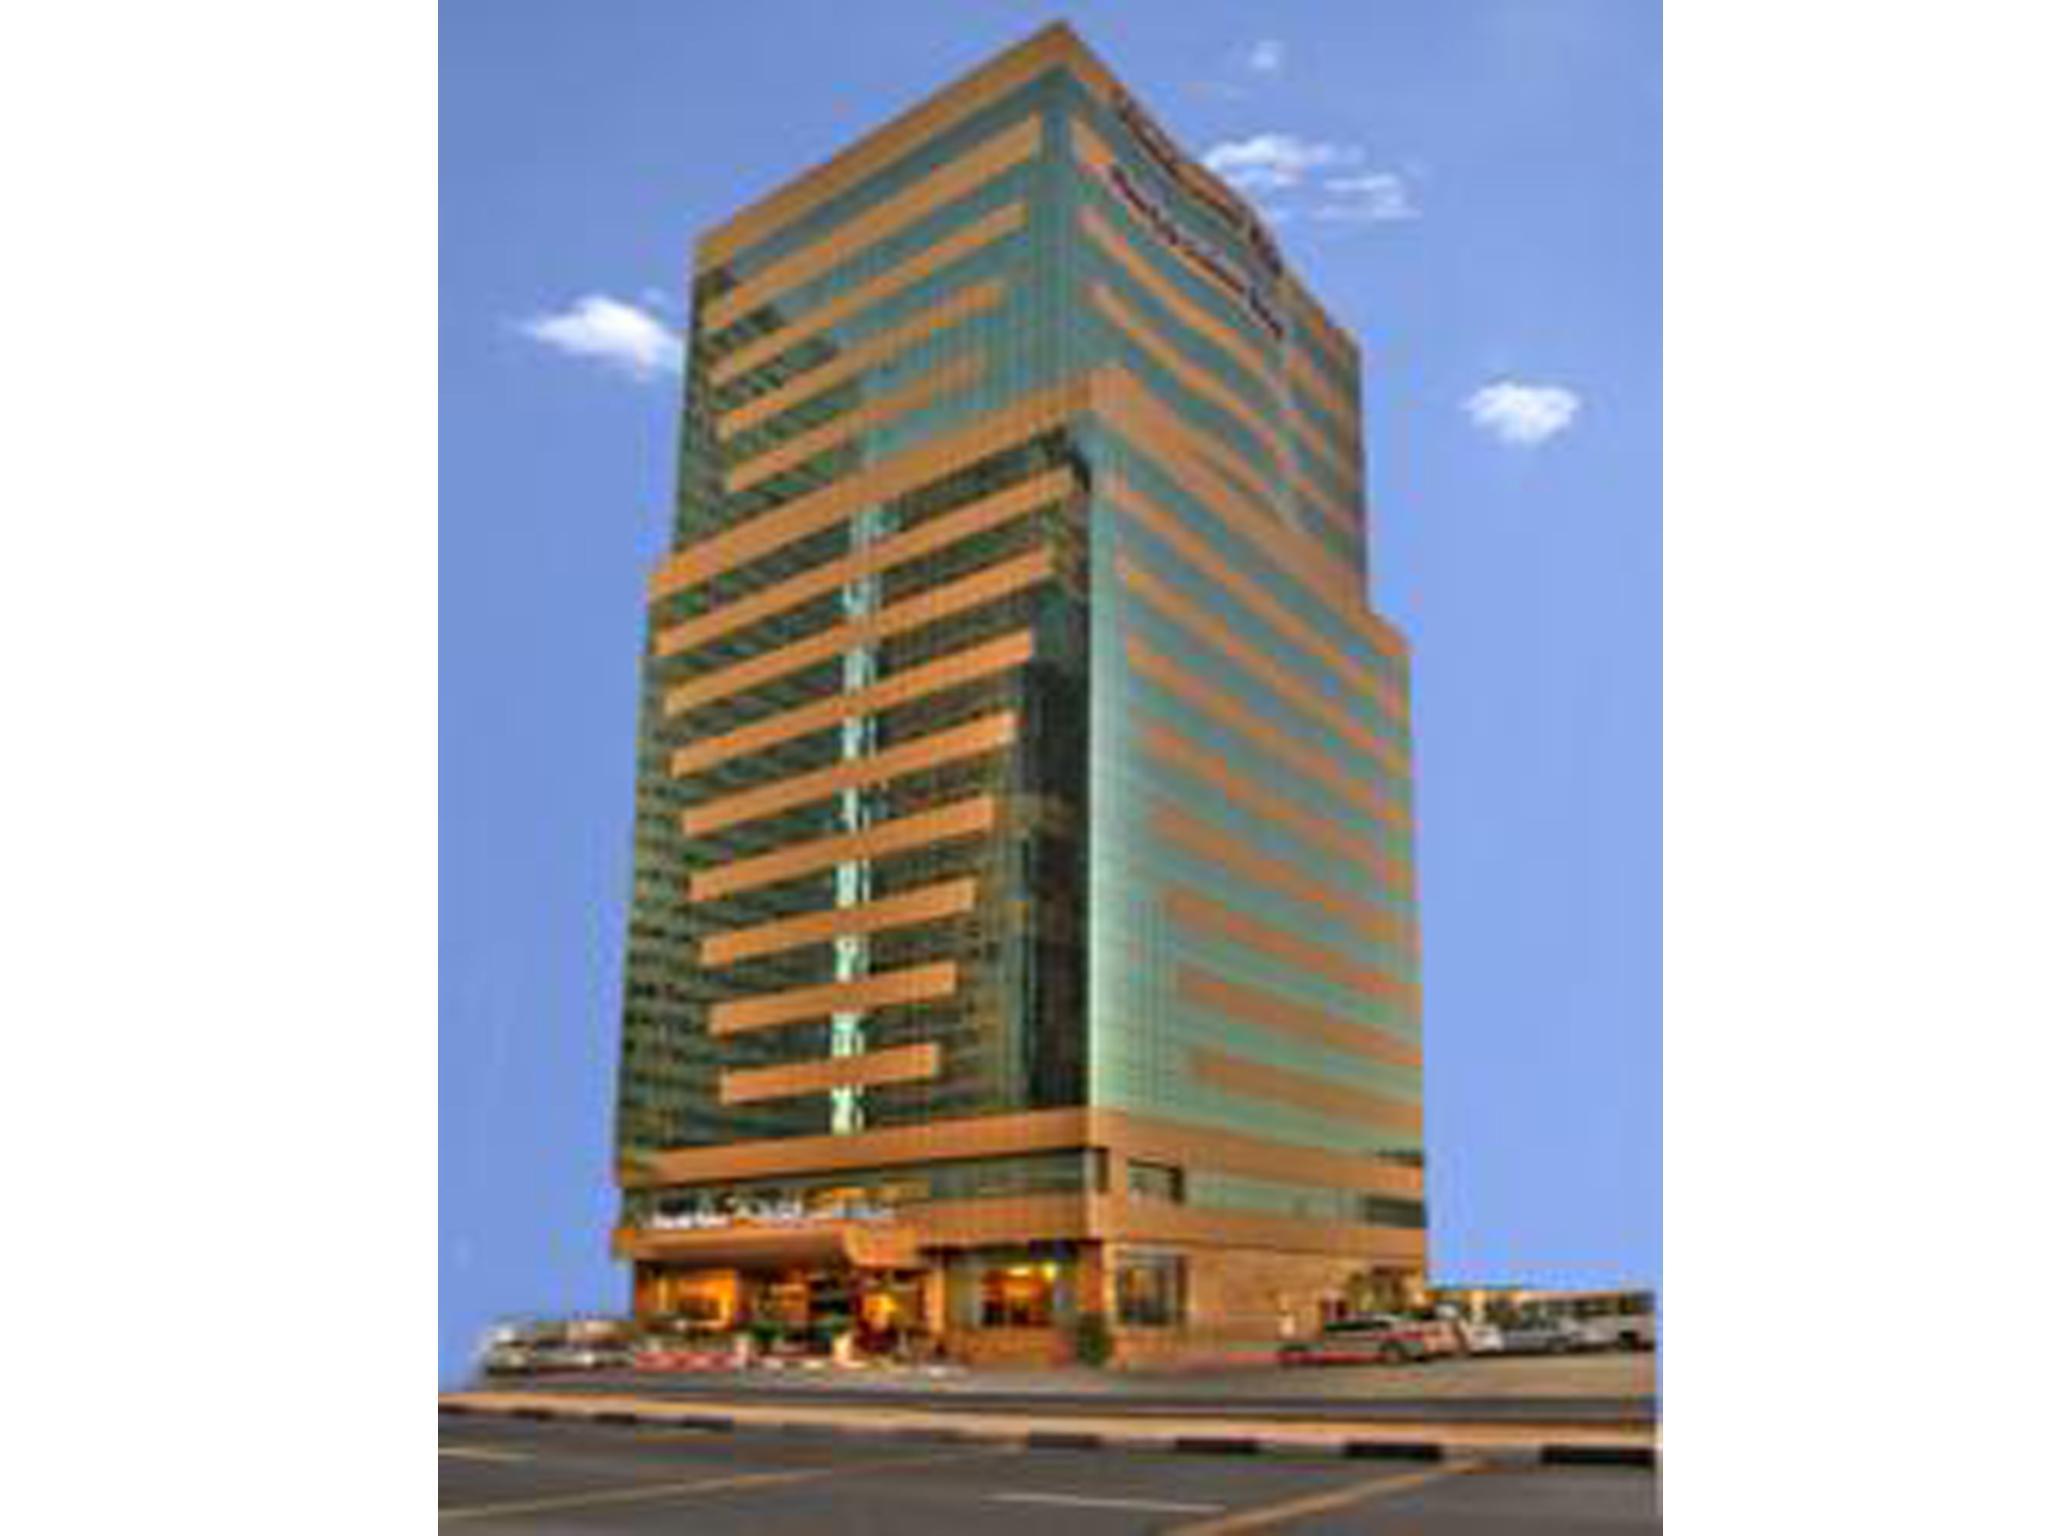 Hotel Copthorne Hotel 4 Sharjah UAE, Sharjah: photos and reviews 94